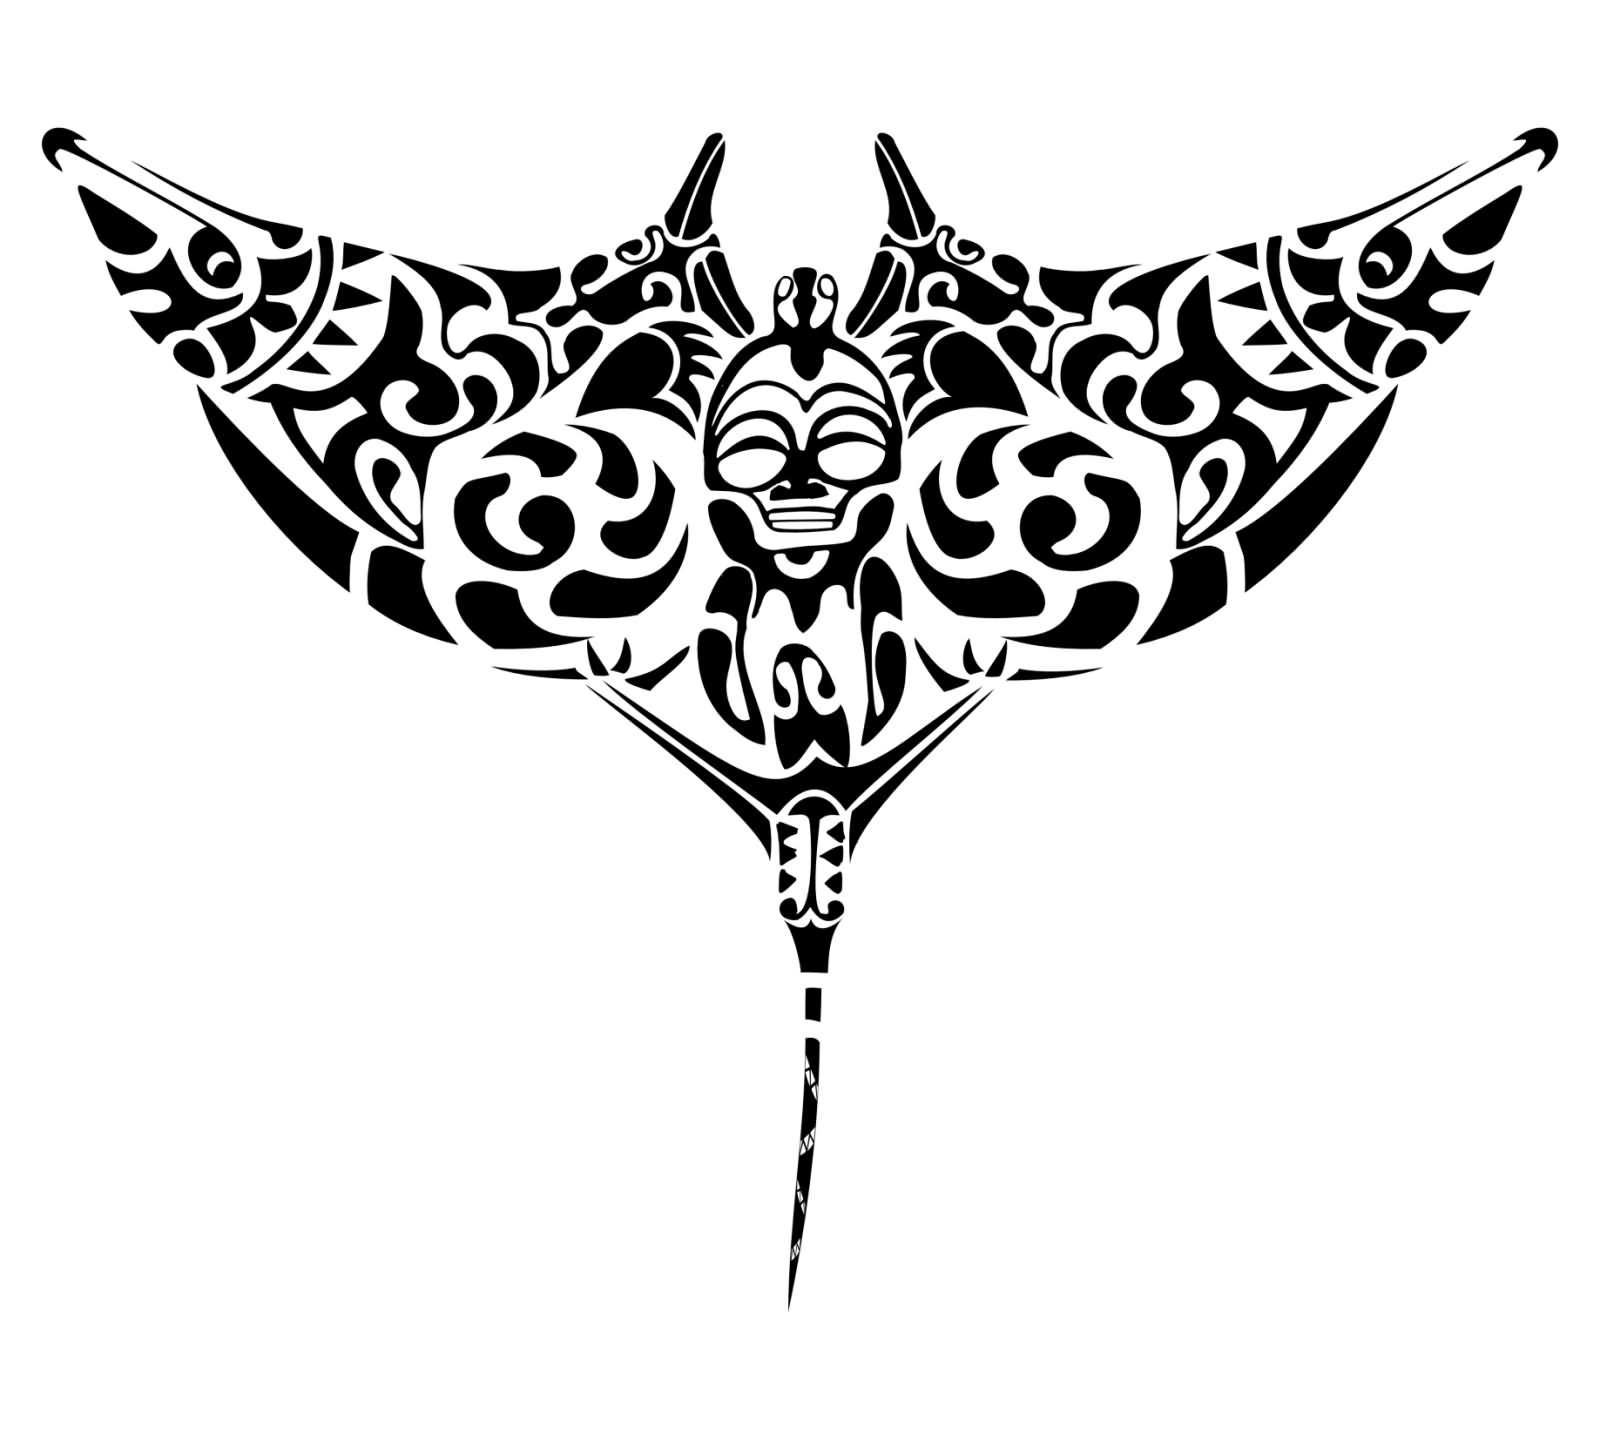 habrumalas orchid tattoo stencil images. Black Bedroom Furniture Sets. Home Design Ideas